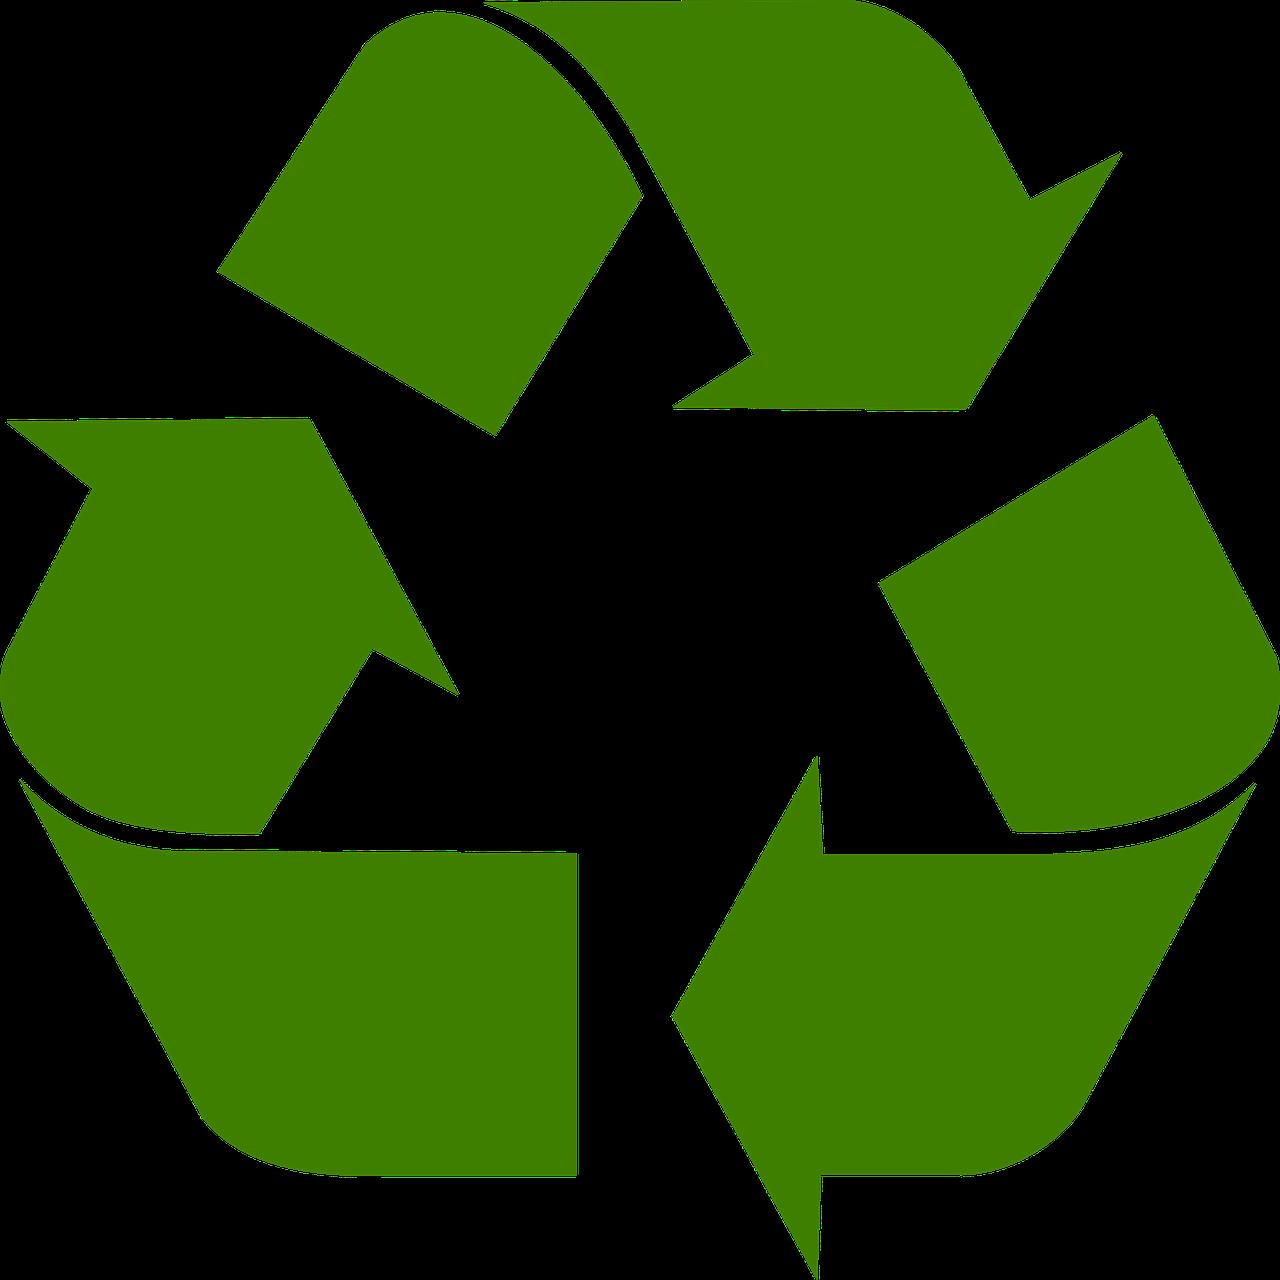 återvinnings symbol By Faux